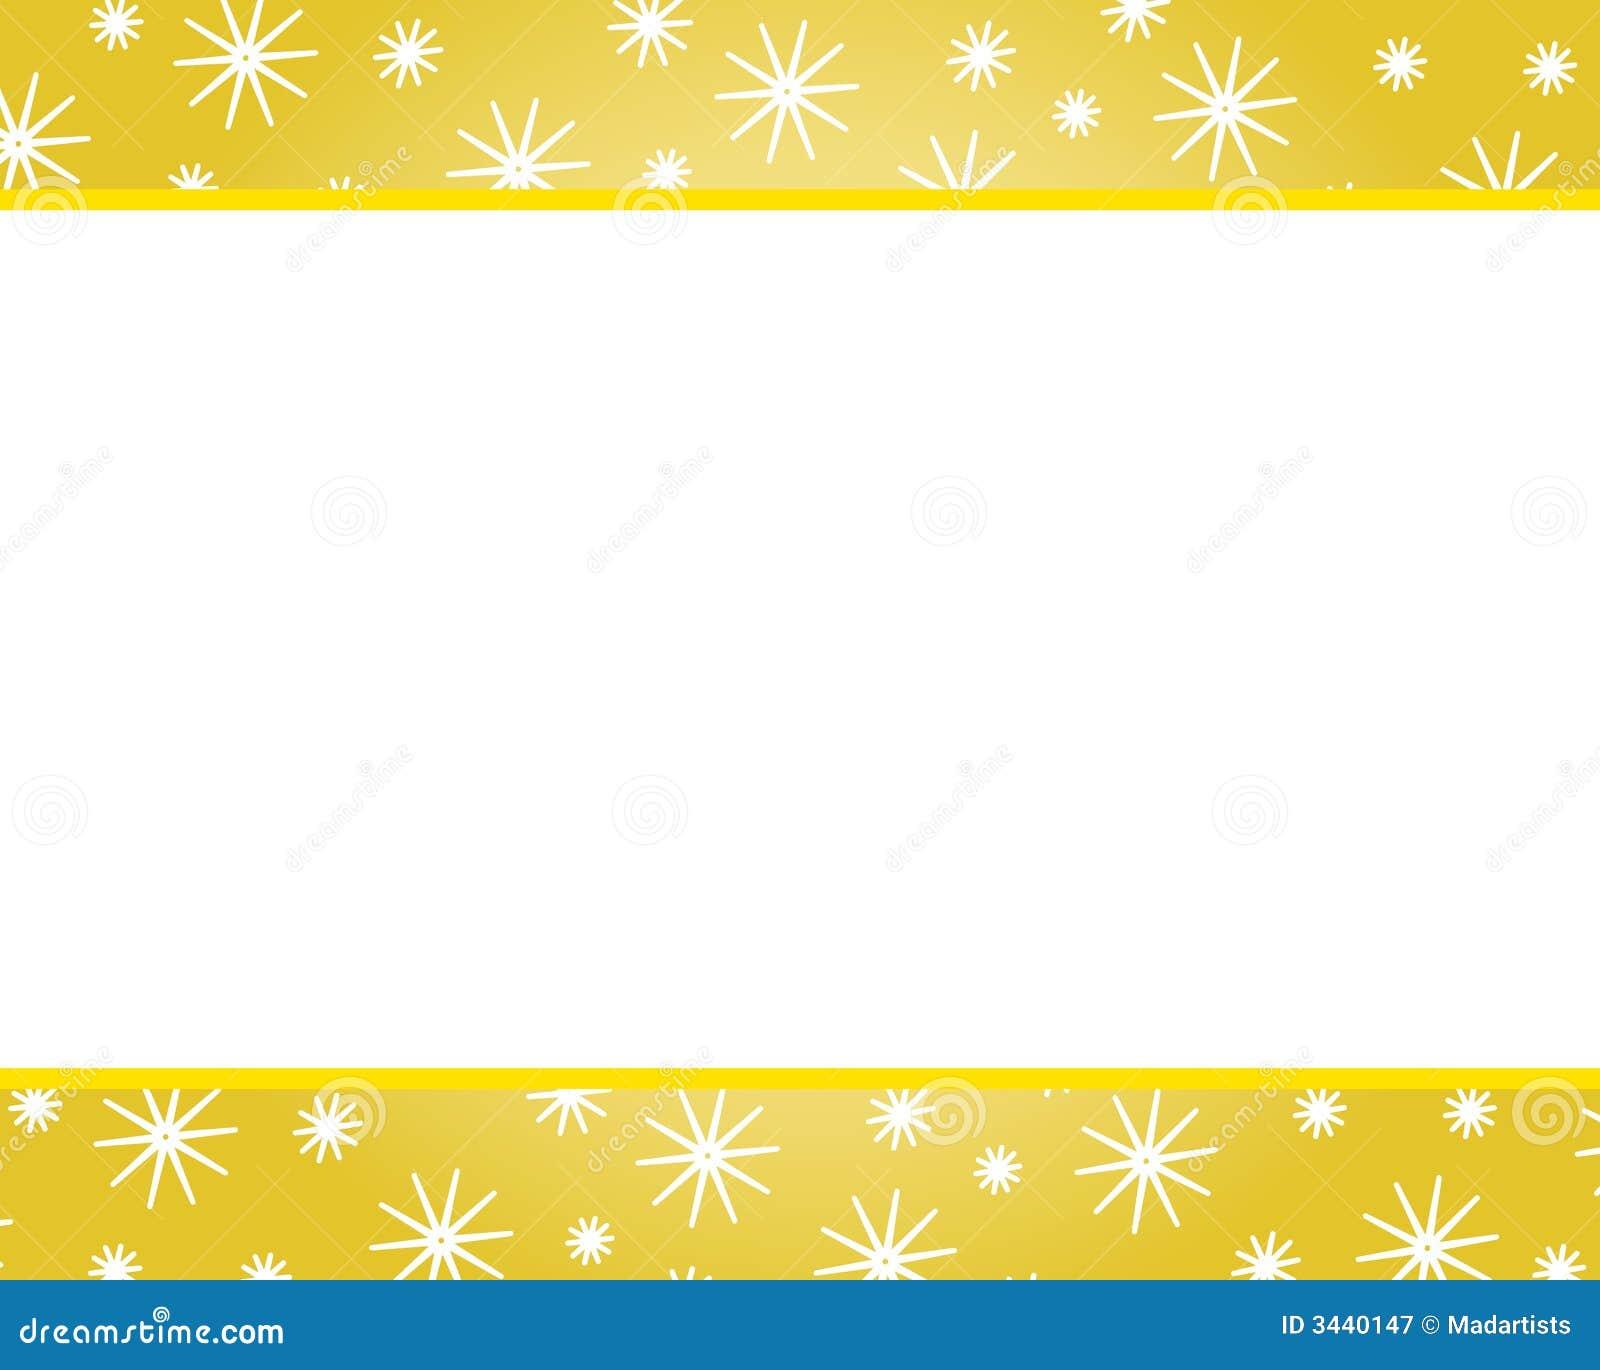 gold christmas borders stock illustration illustration of ornaments